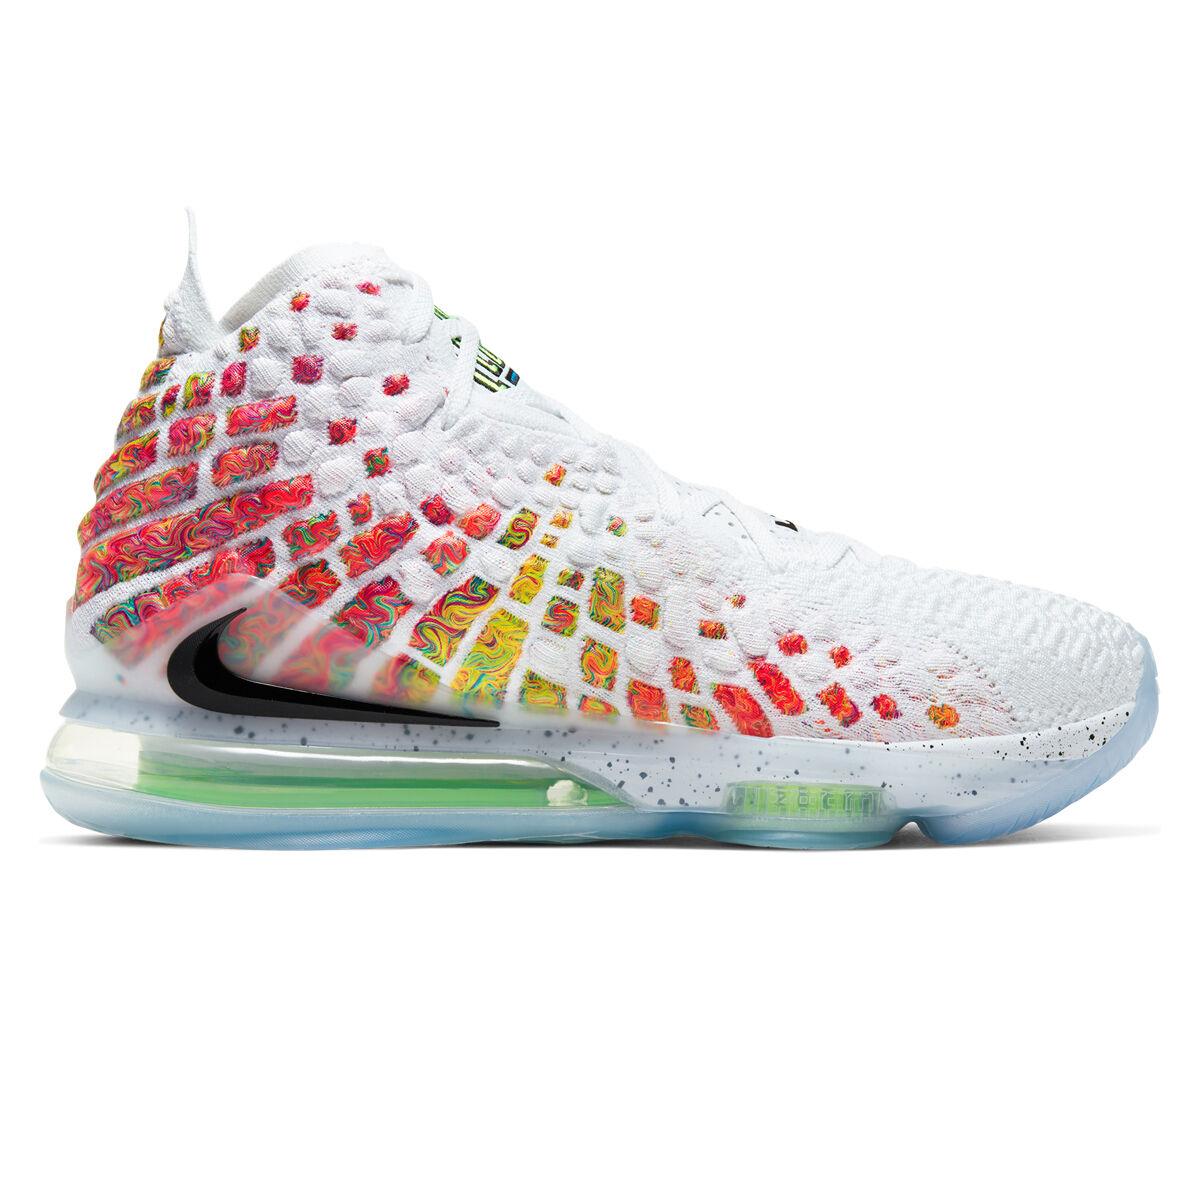 Nike LeBron XVII Mens Basketball Shoes